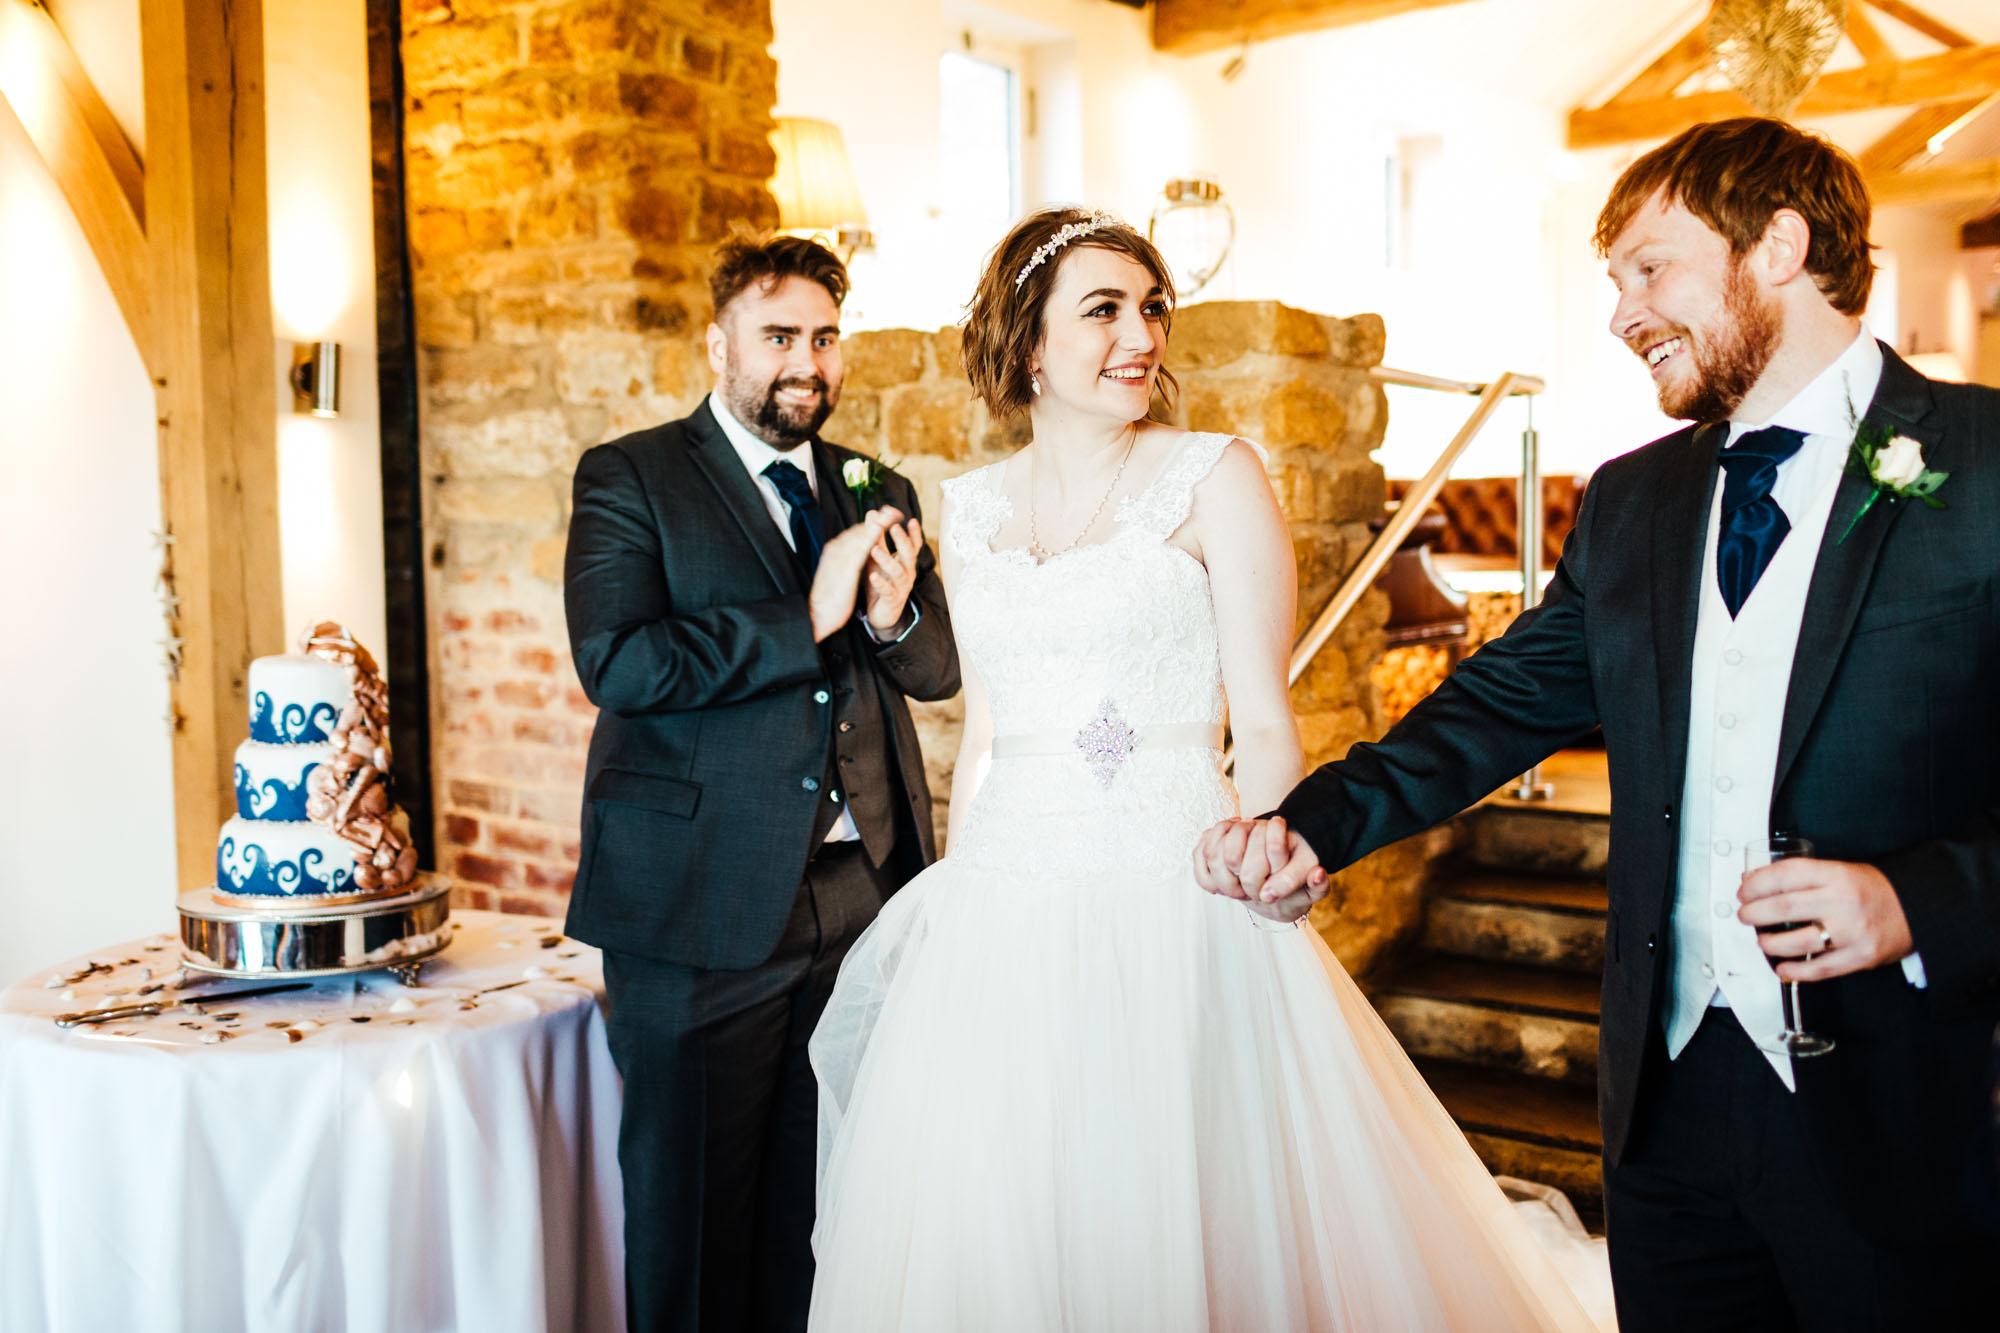 wedding-at-dodford-manor-64